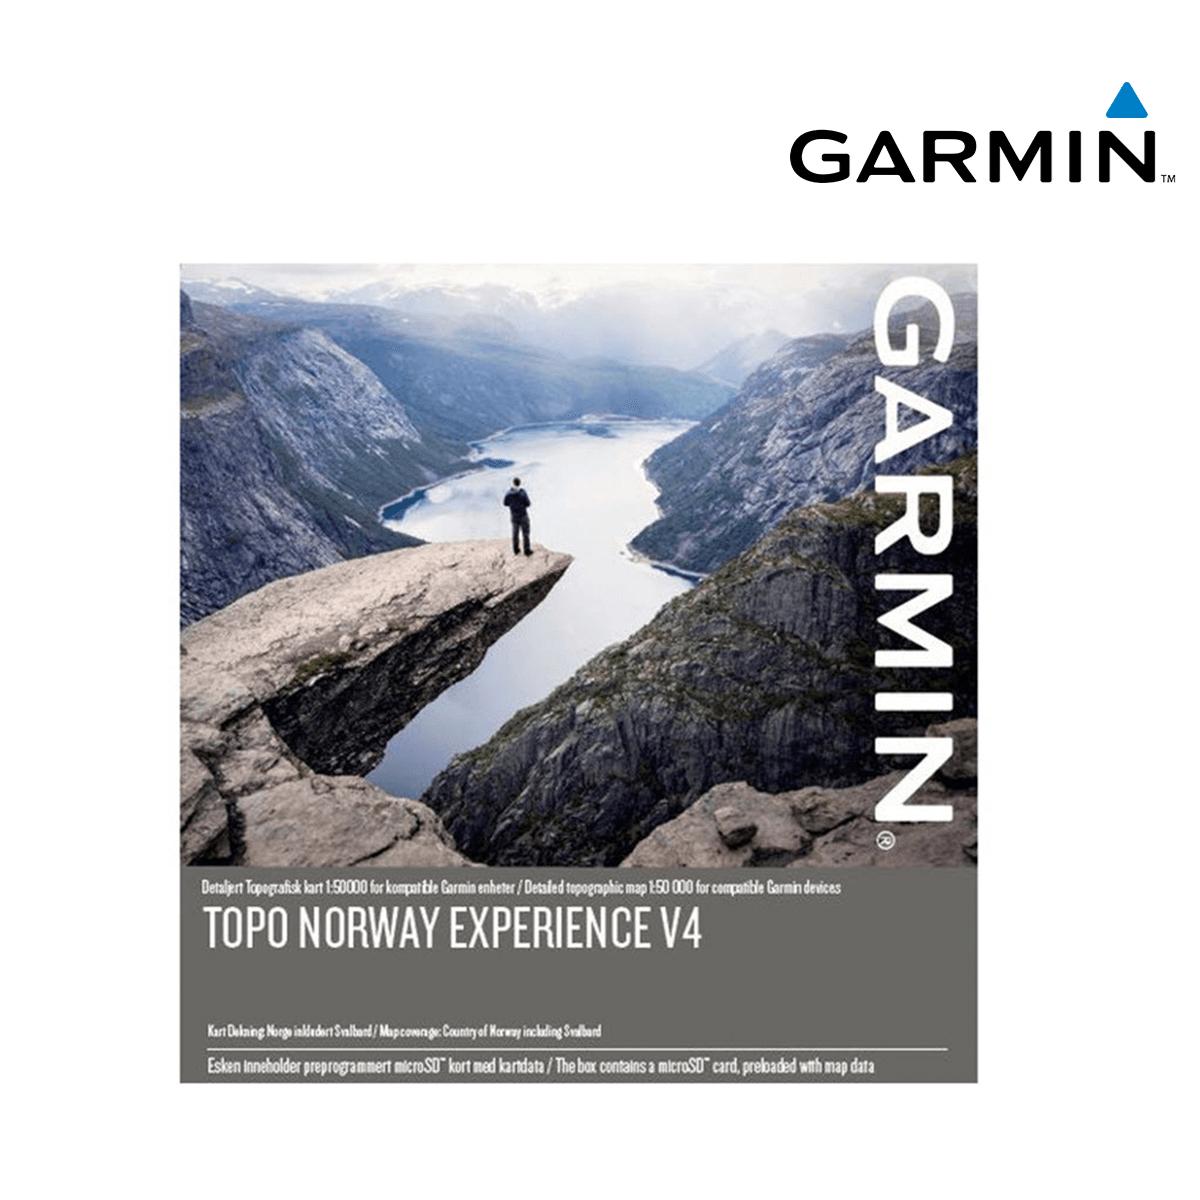 Bilde av TOPO Norway Experience v4